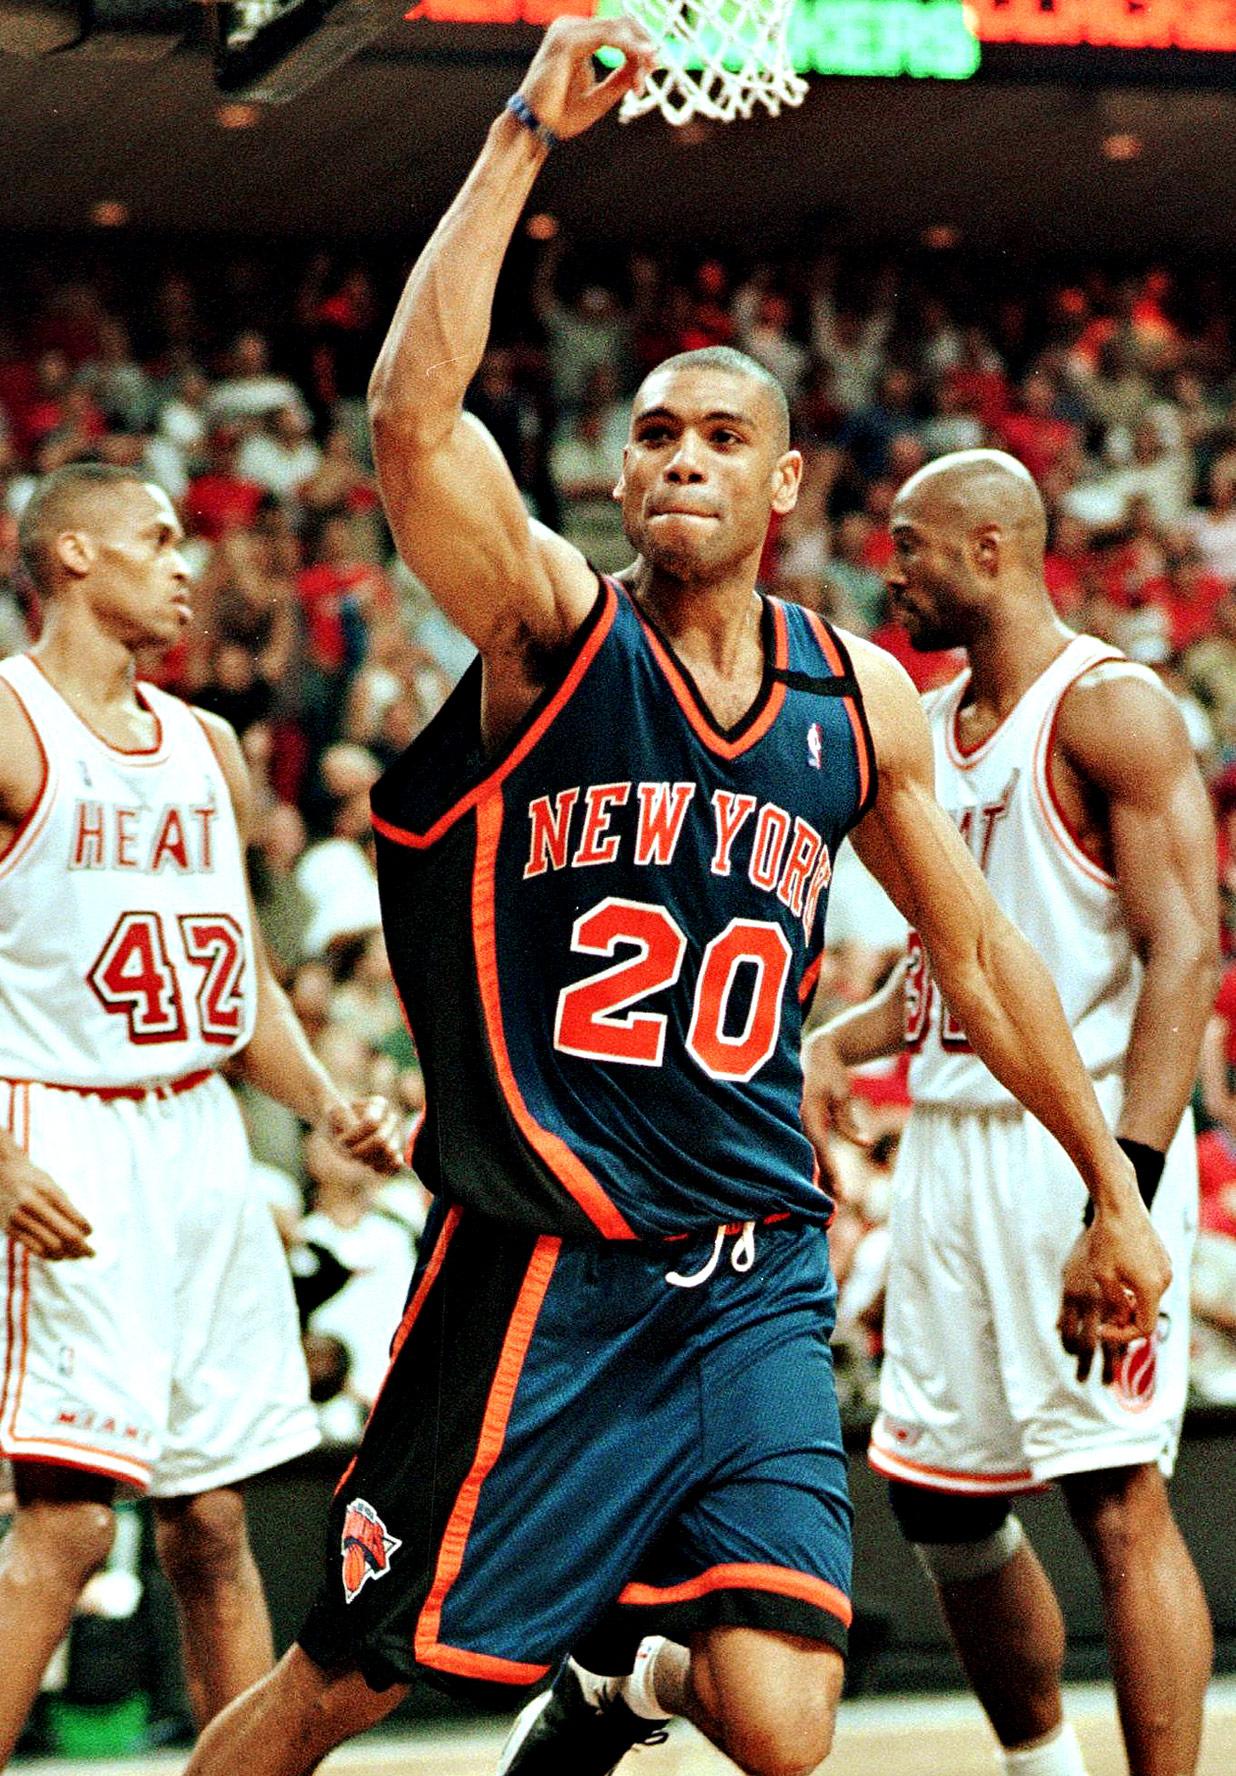 No. 2: The Runner - New York Knicks' Top 10 Playoff ...